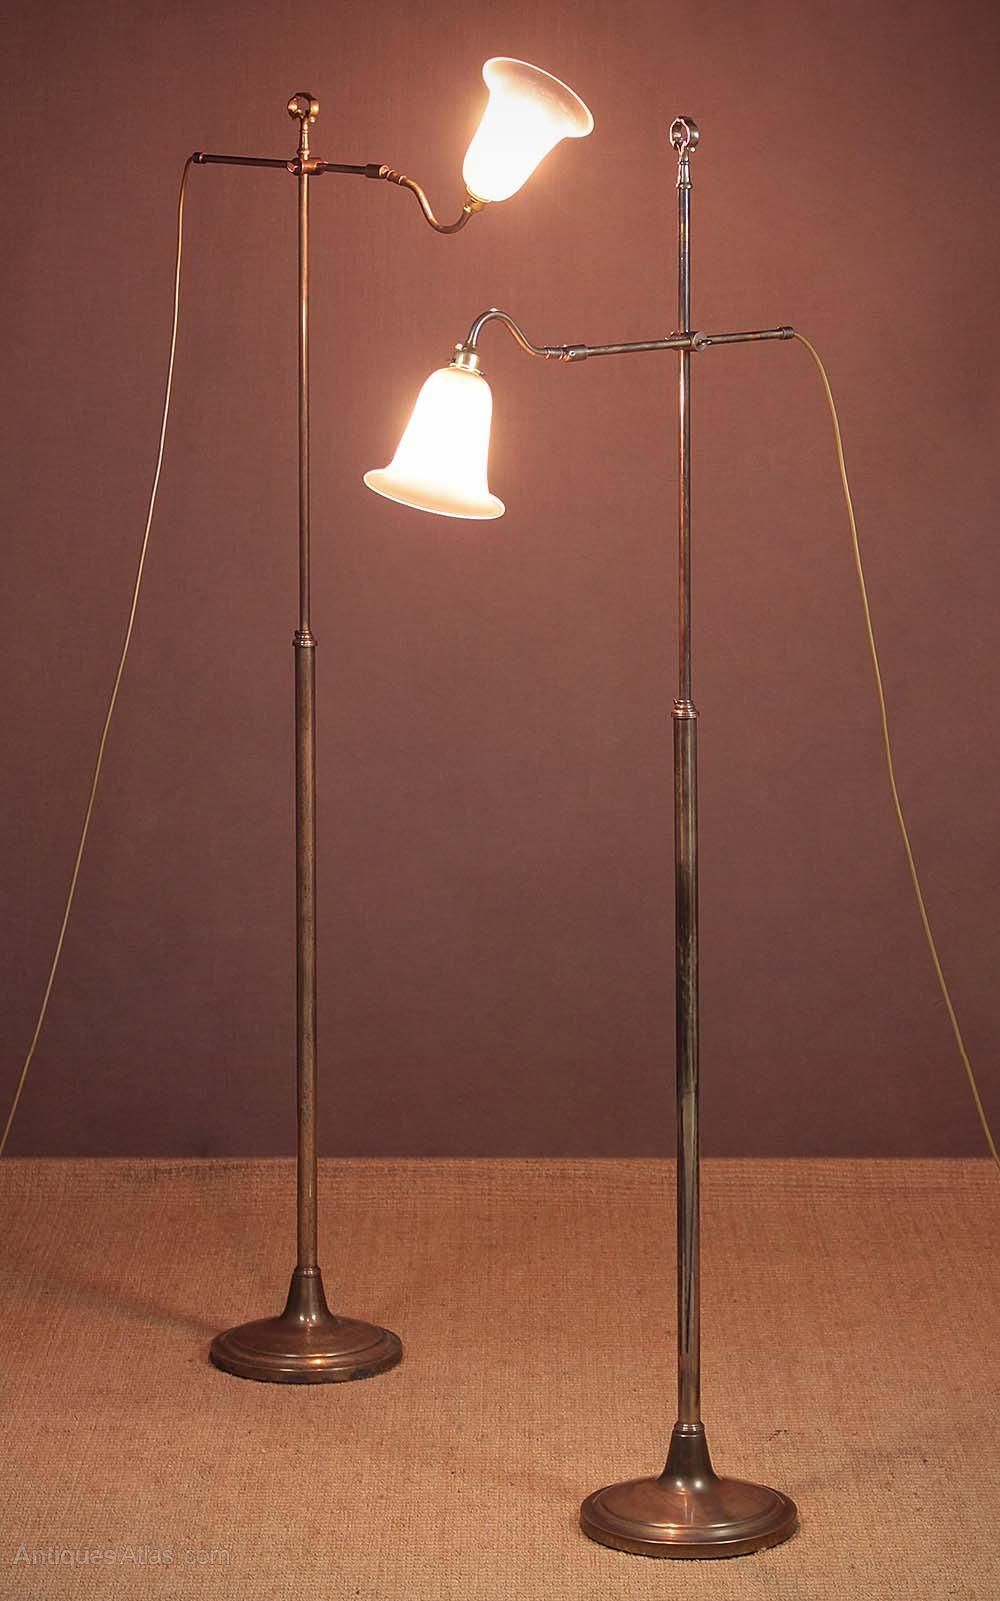 Antiques atlas pair brass floor standing reading lamps c for 1930 floor lamps